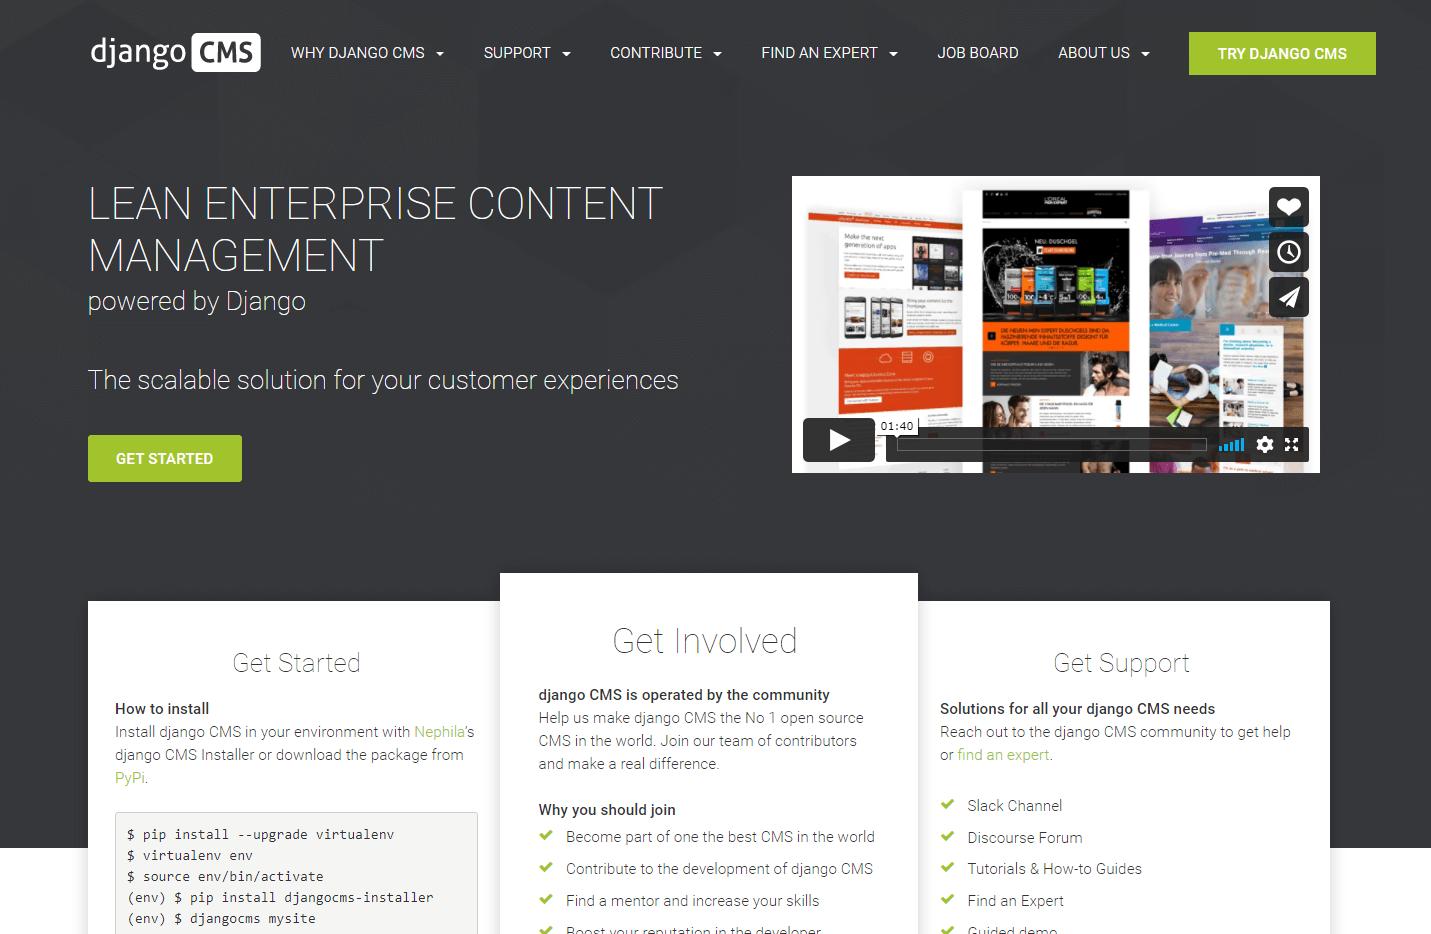 The homepage for Django CMS.